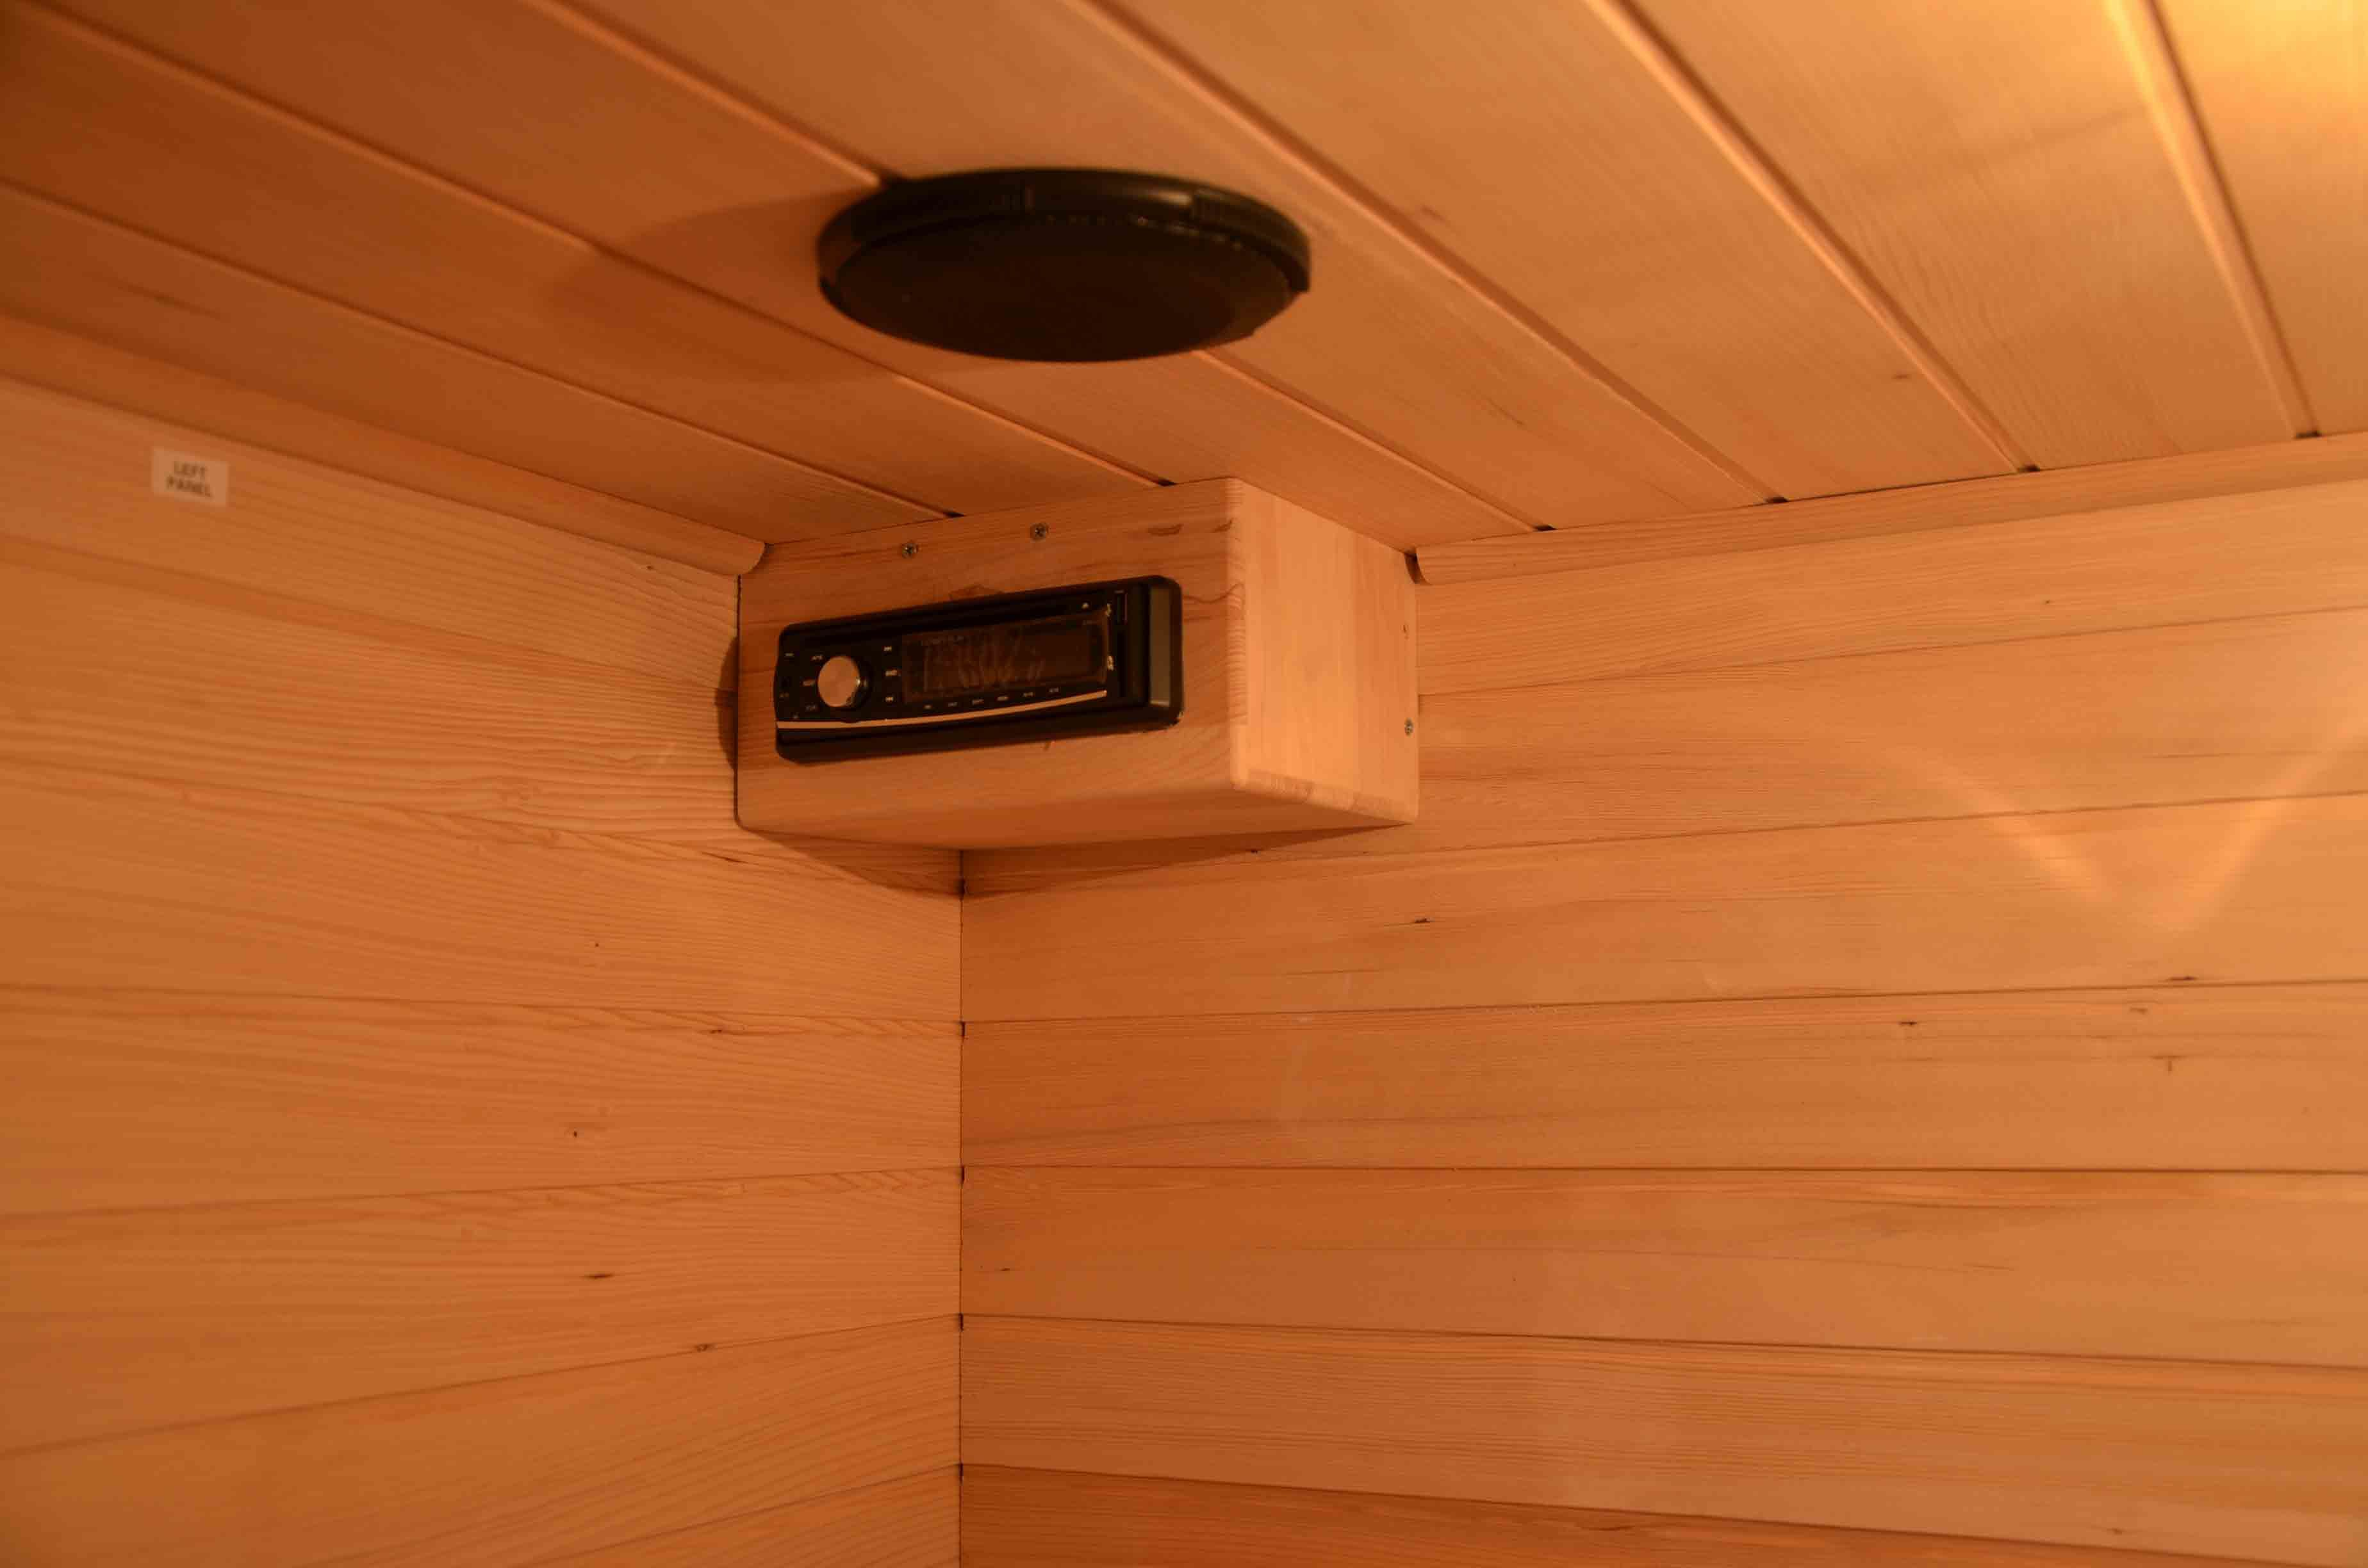 2016 New Design Far Infrared Sauna Room Hotwind Sauna for 4 People (SEK-B4)